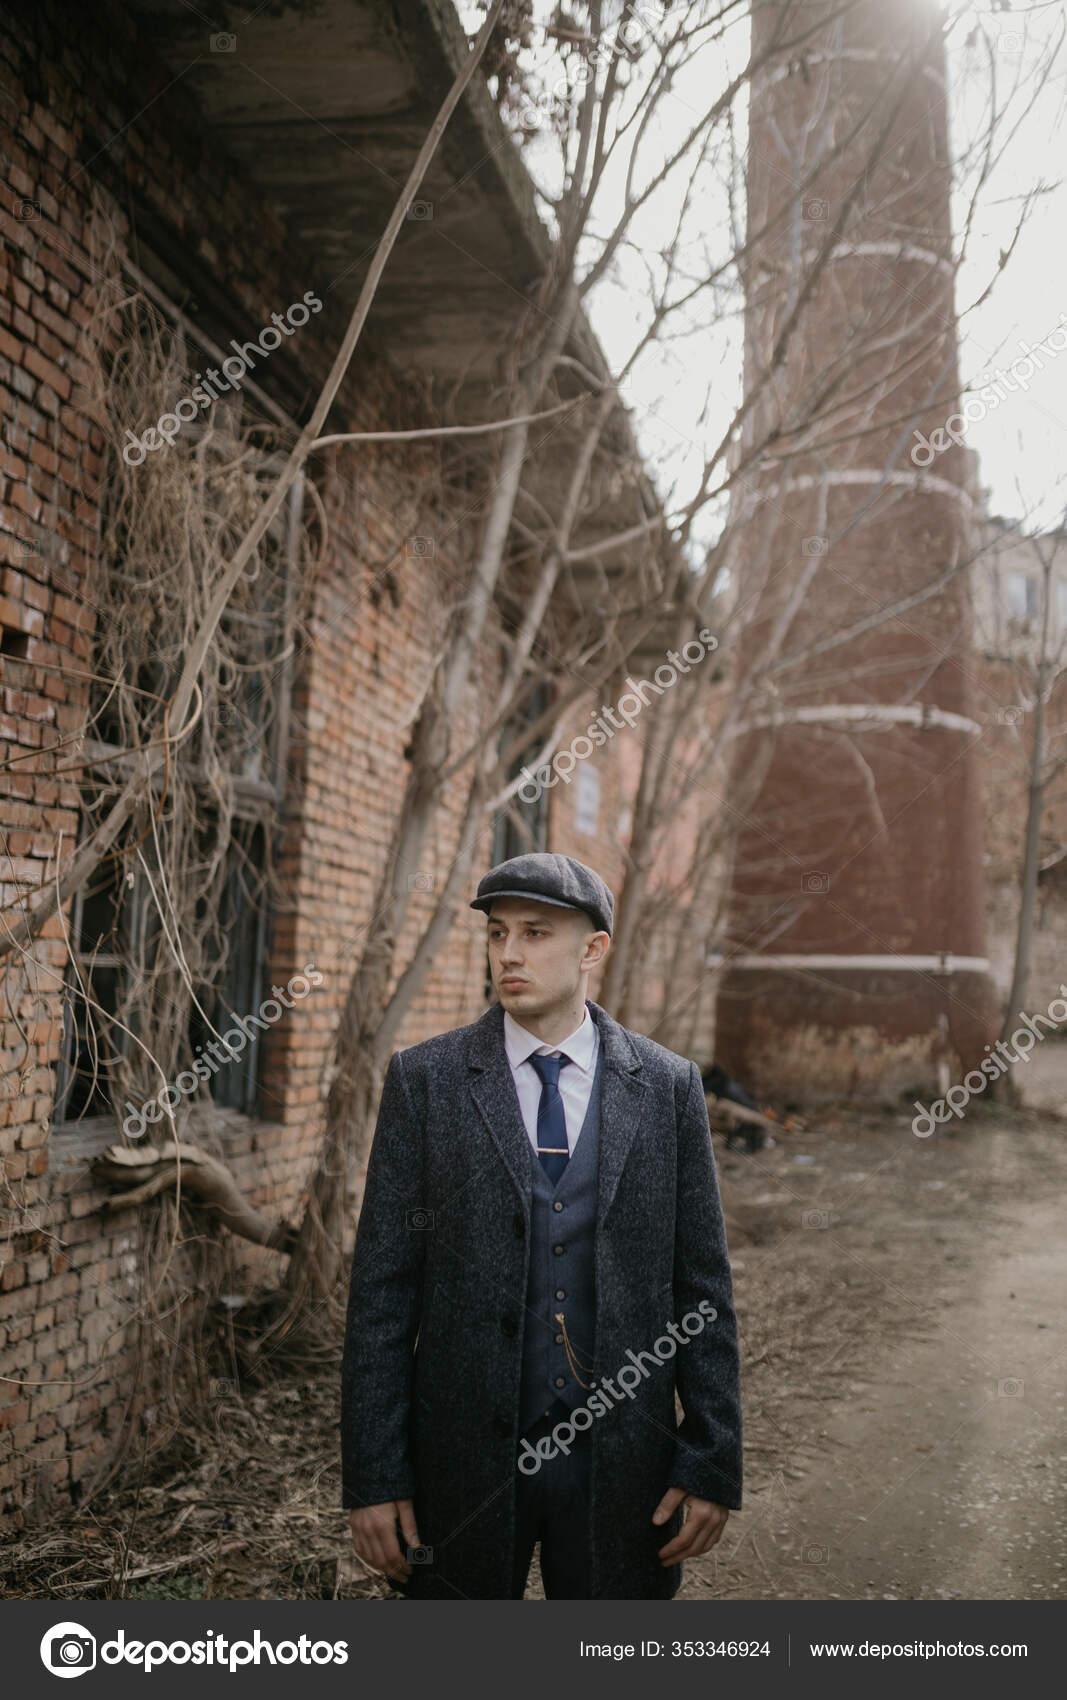 Man Posing Image English Retro Gangster 1920s Dressed Peaky Blinders Stock Photo C Stasia04 353346924